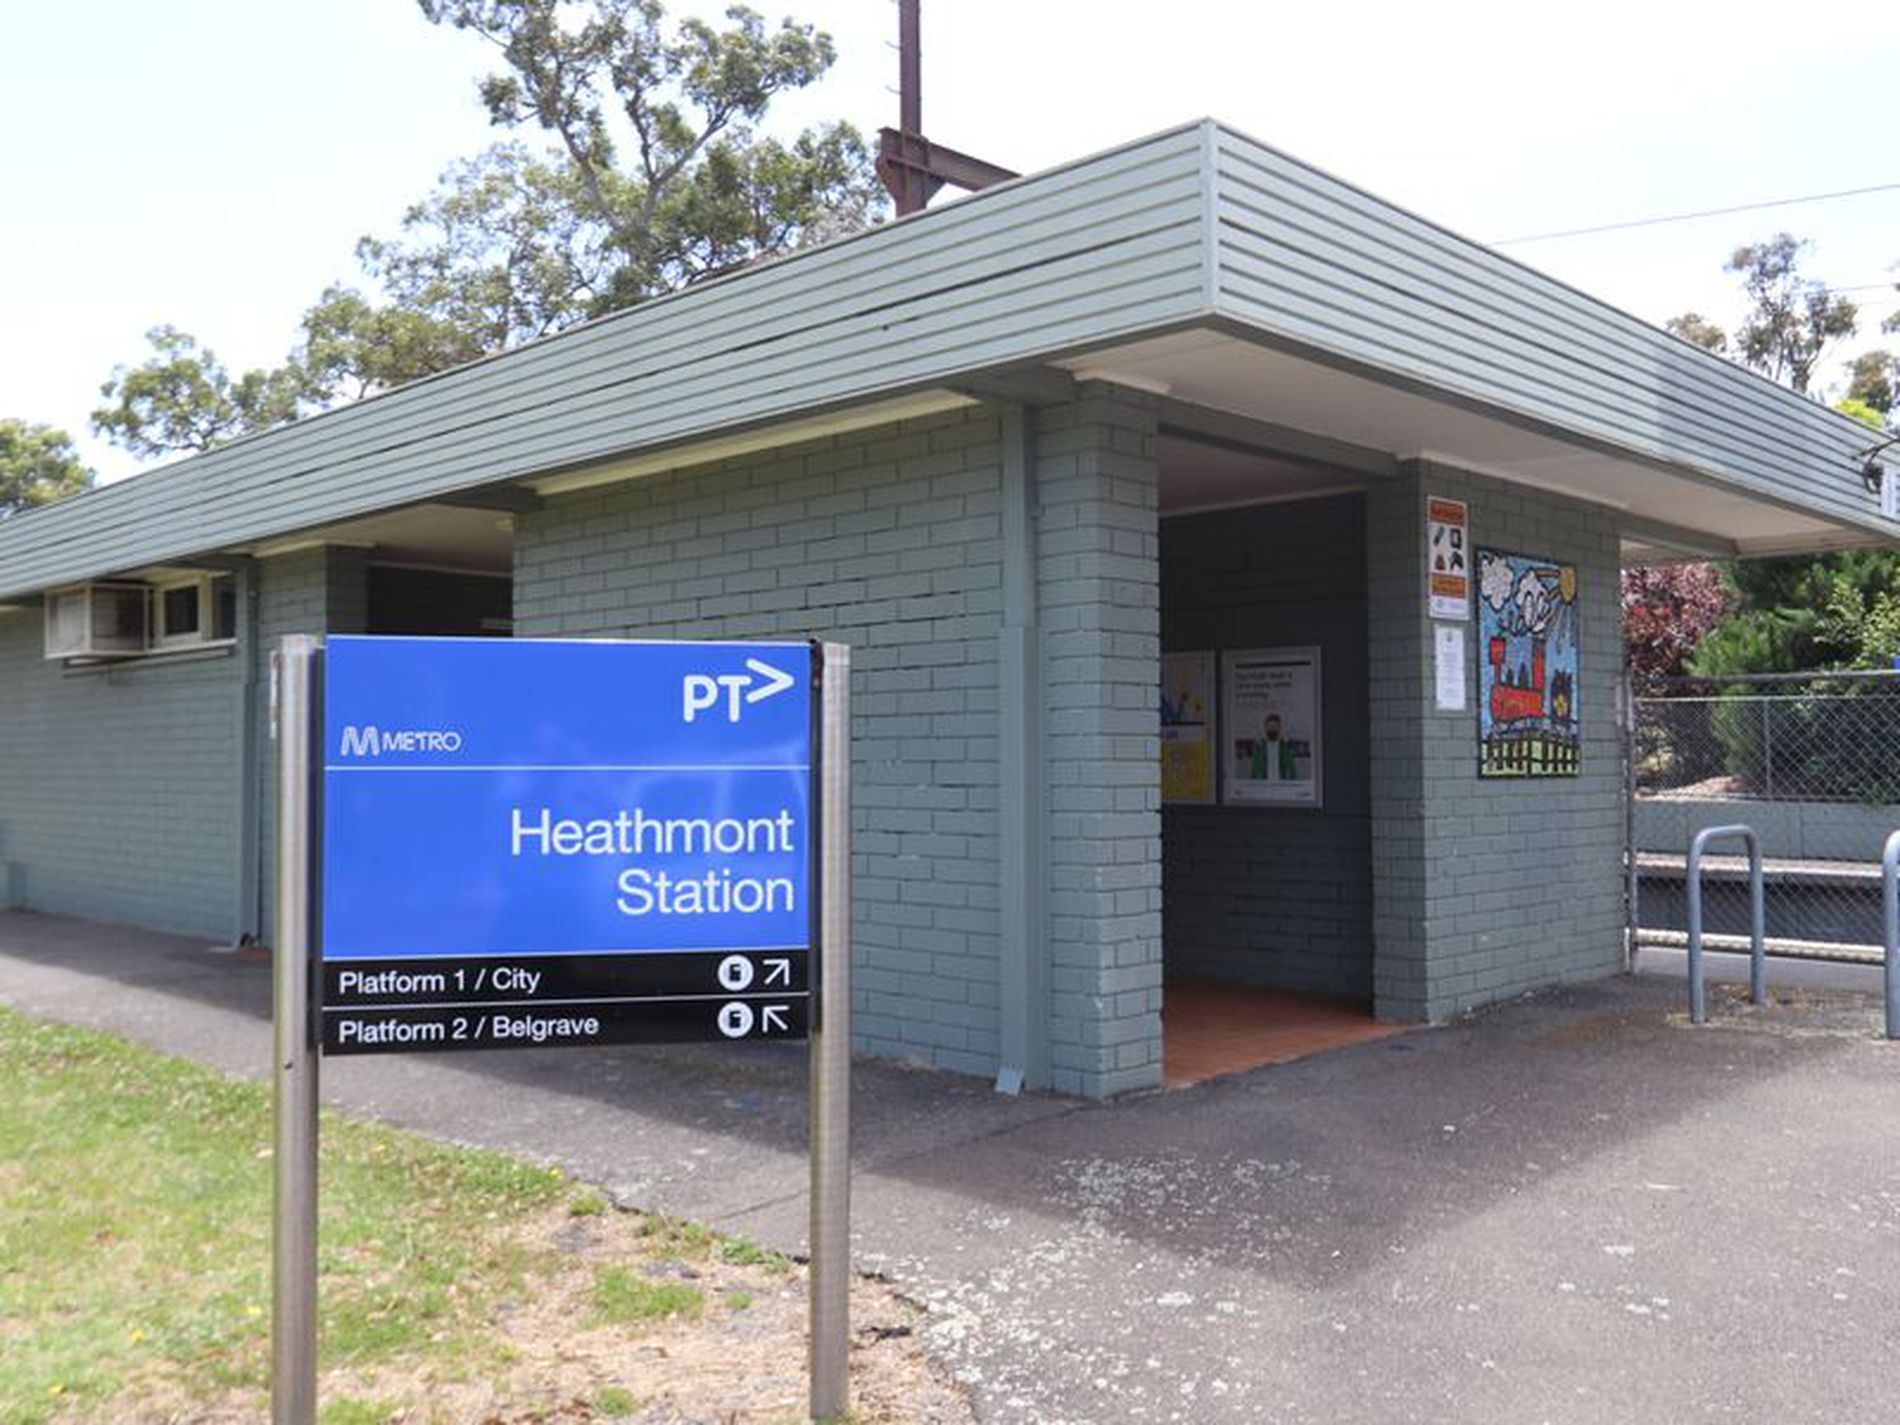 167 Canterbury Road, Heathmont